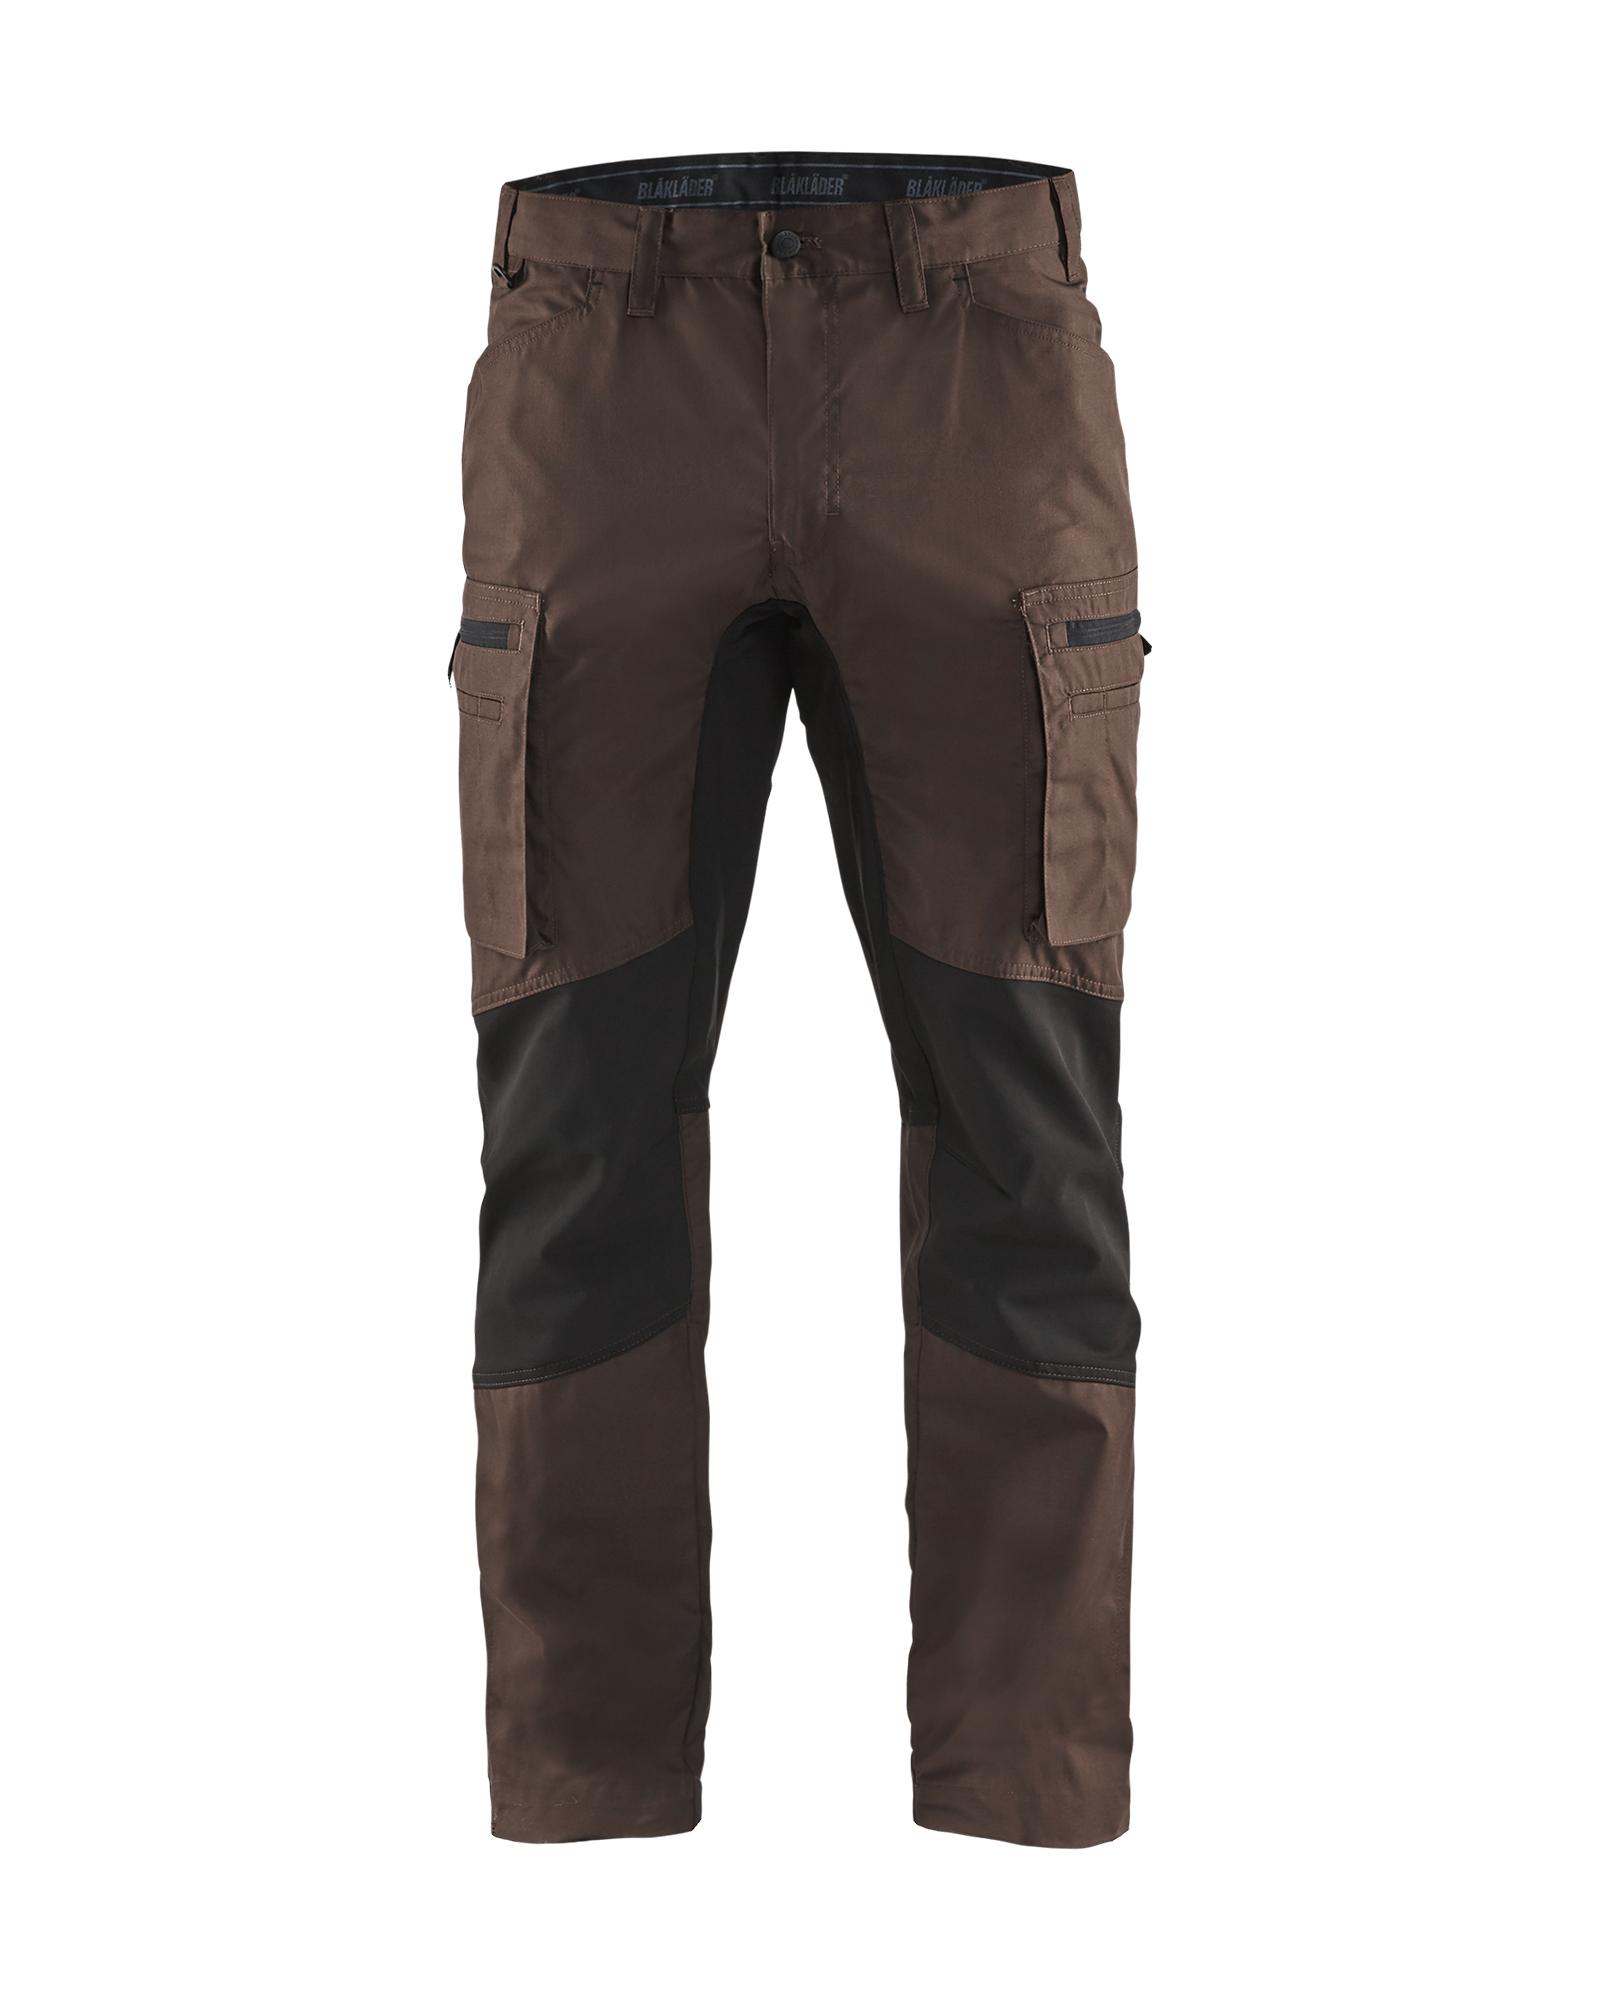 Bekleidung Neu Peter Storm Damen Marly Full Zip Fleece Outdoorbekleidung Hellrosa Camping & Outdoor